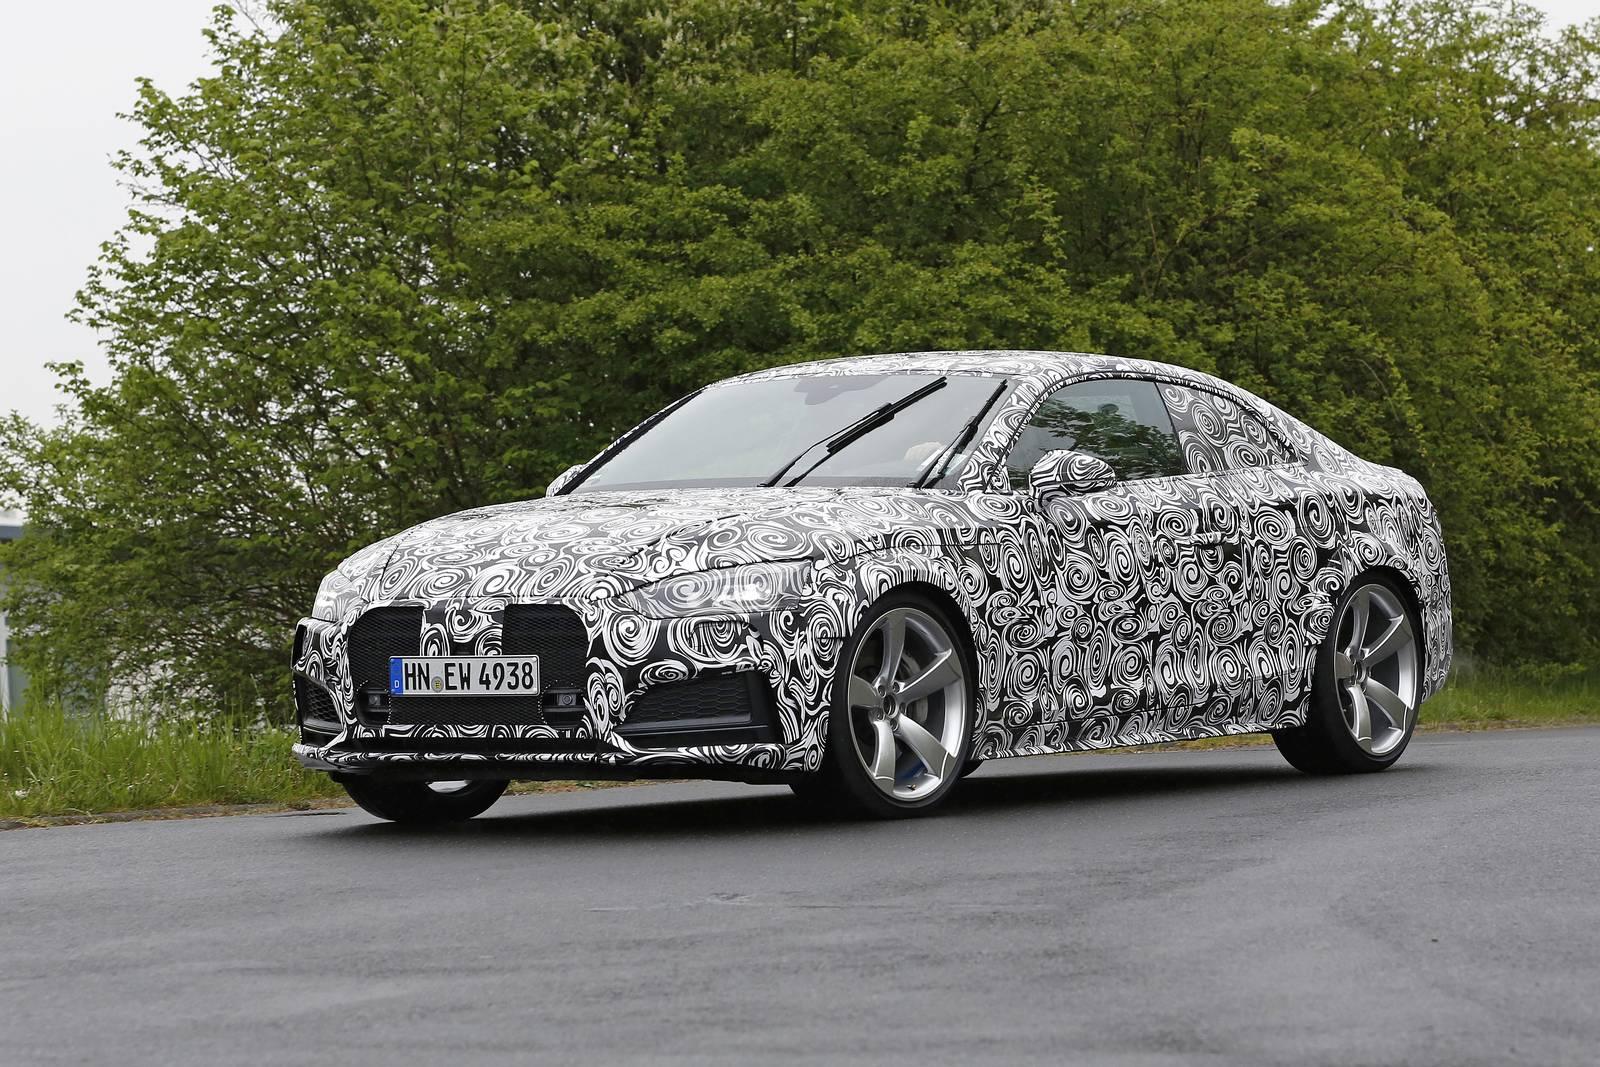 2018 Audi RS5 First Test Mule Spy Shots - GTspirit